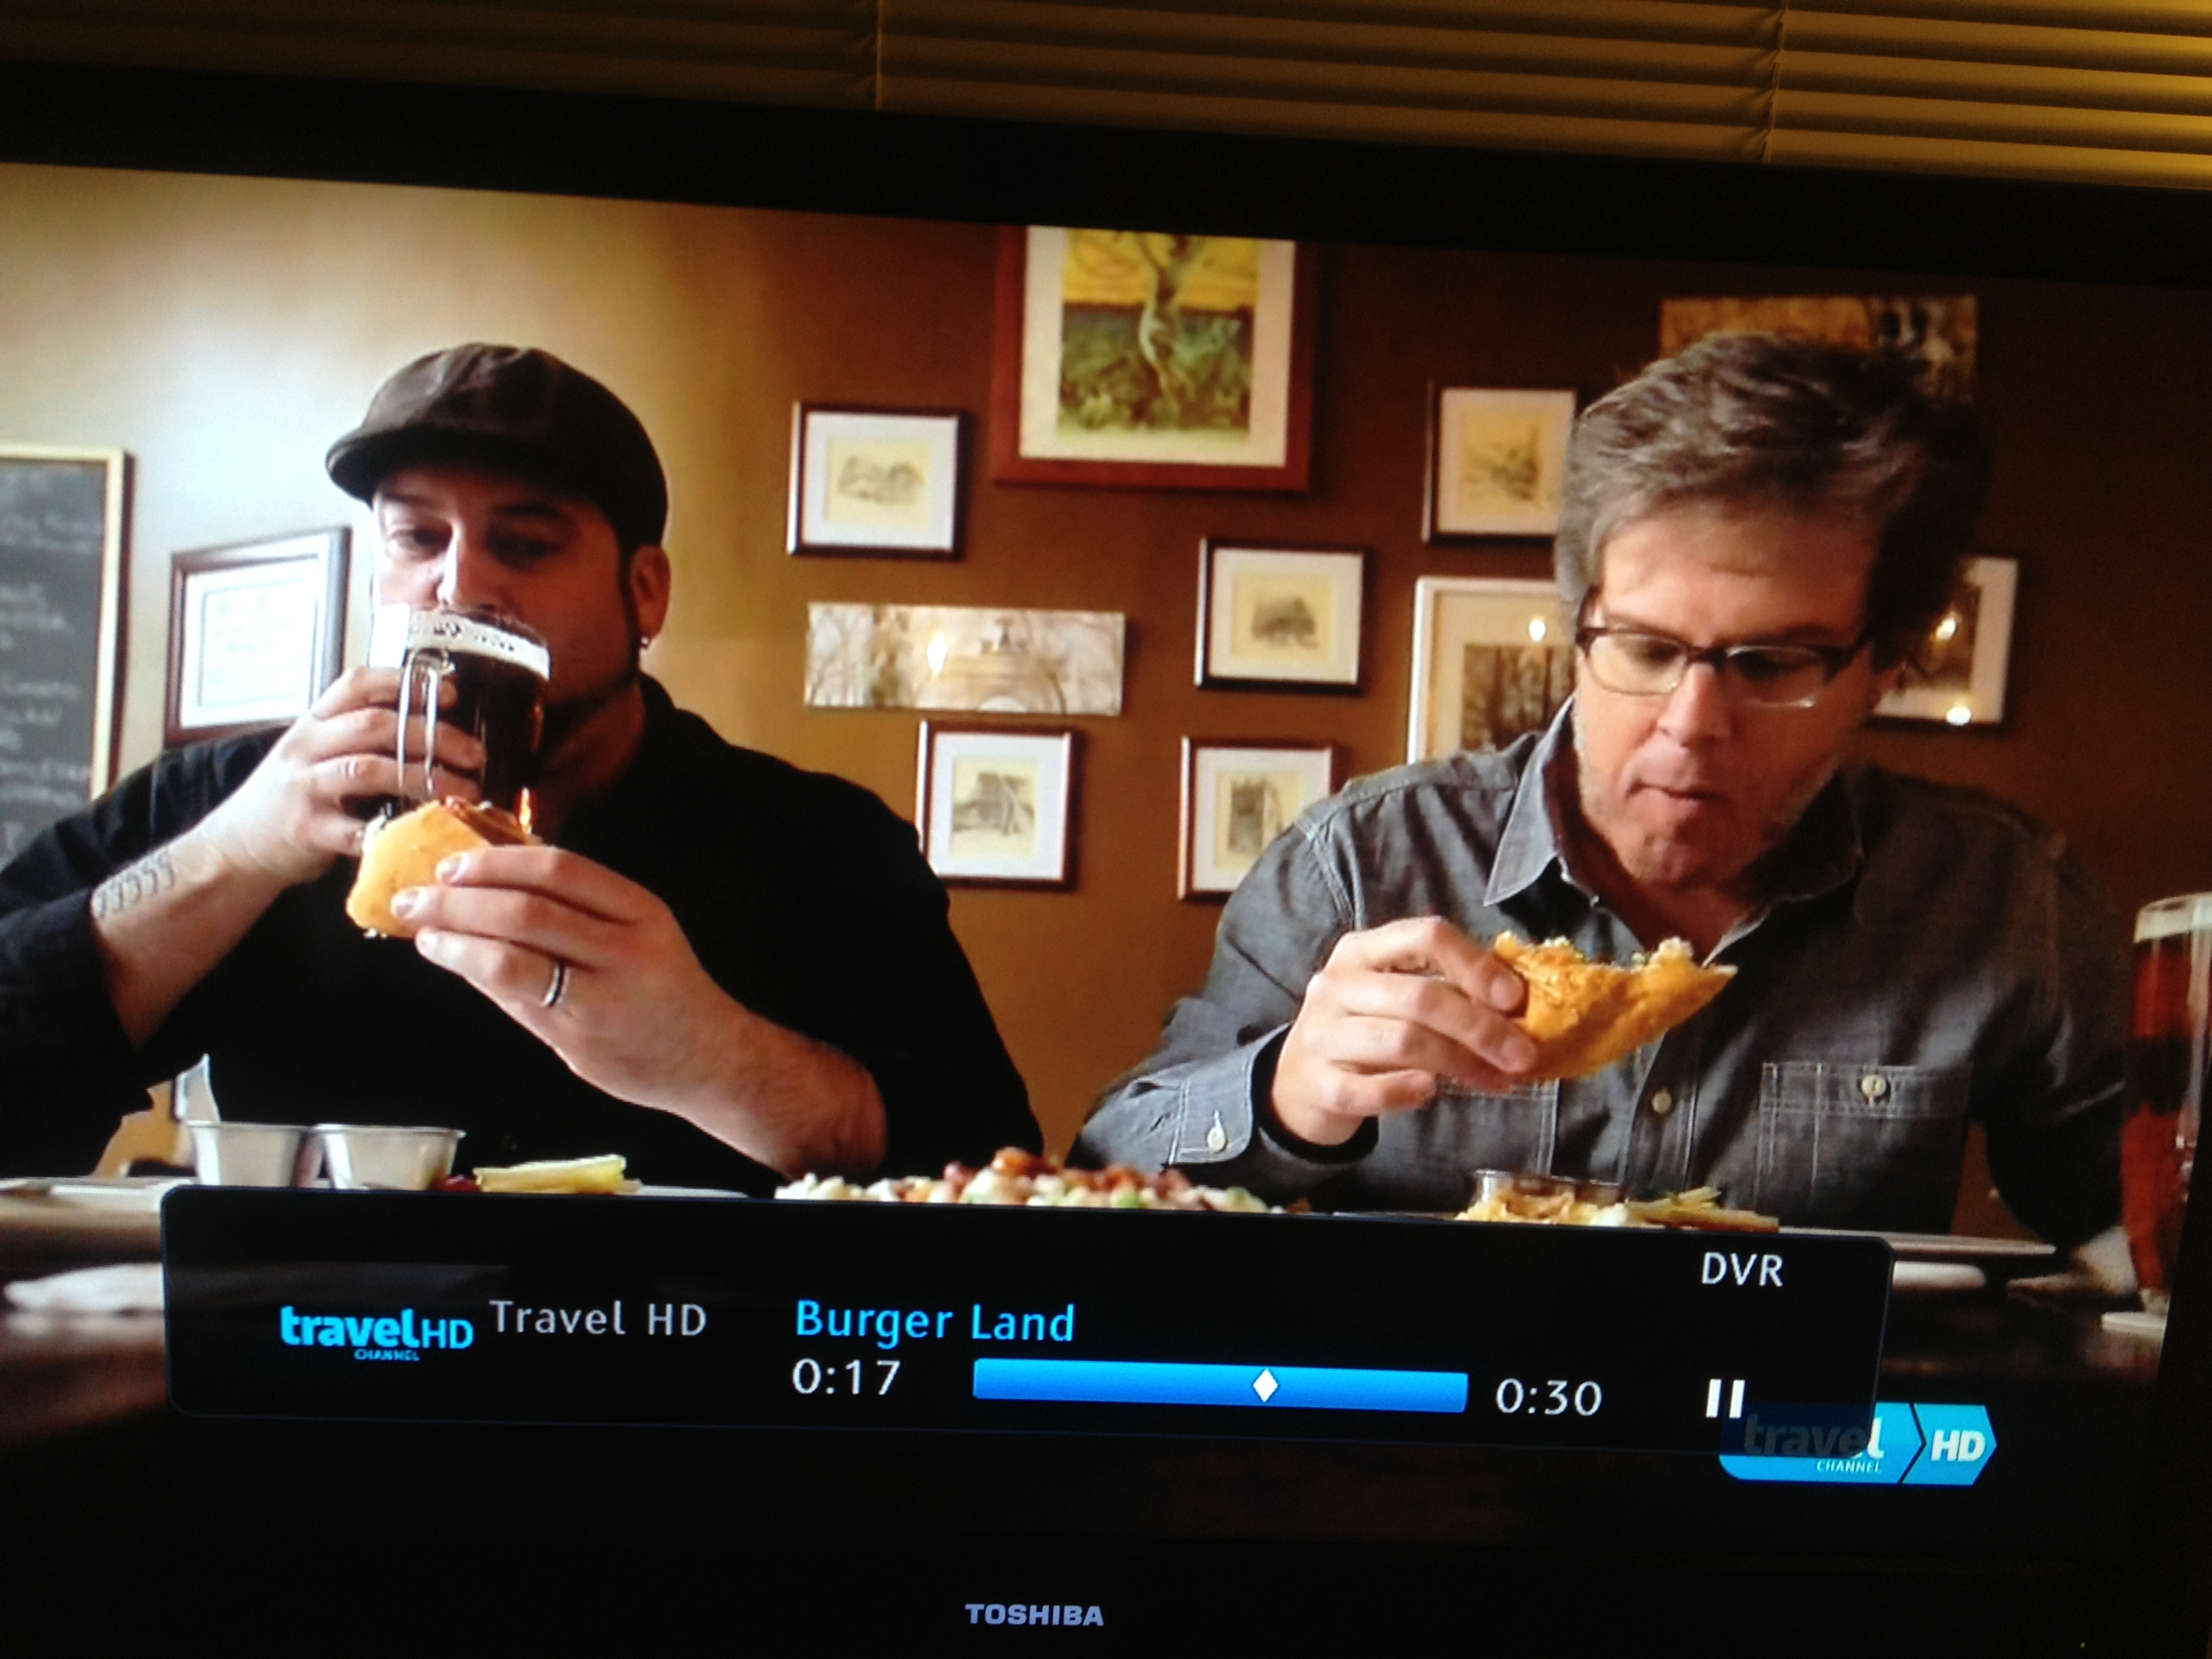 david-rev-ciancio-expert-burger-taster-burger-land-motz-burger-famous-tv_0136